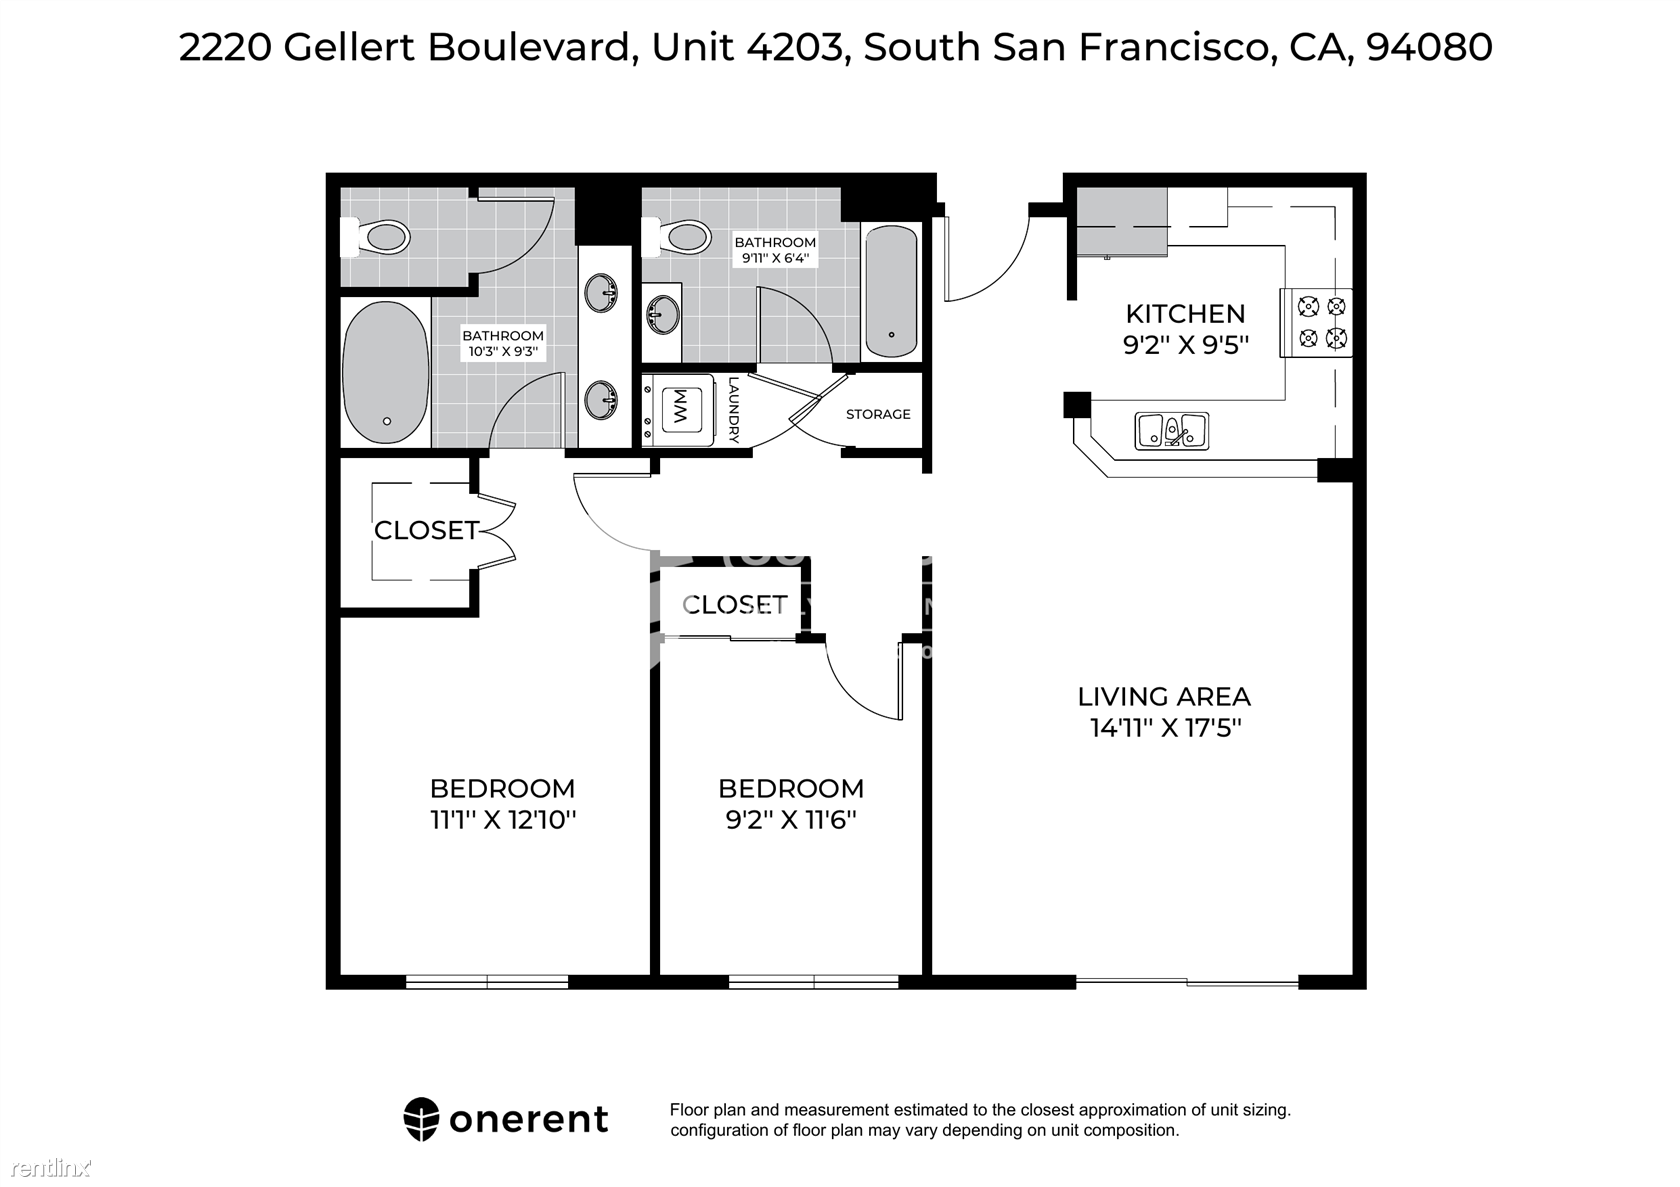 2220 Gellert Boulevard Unit 4203, South San Francisco, CA - $3,150